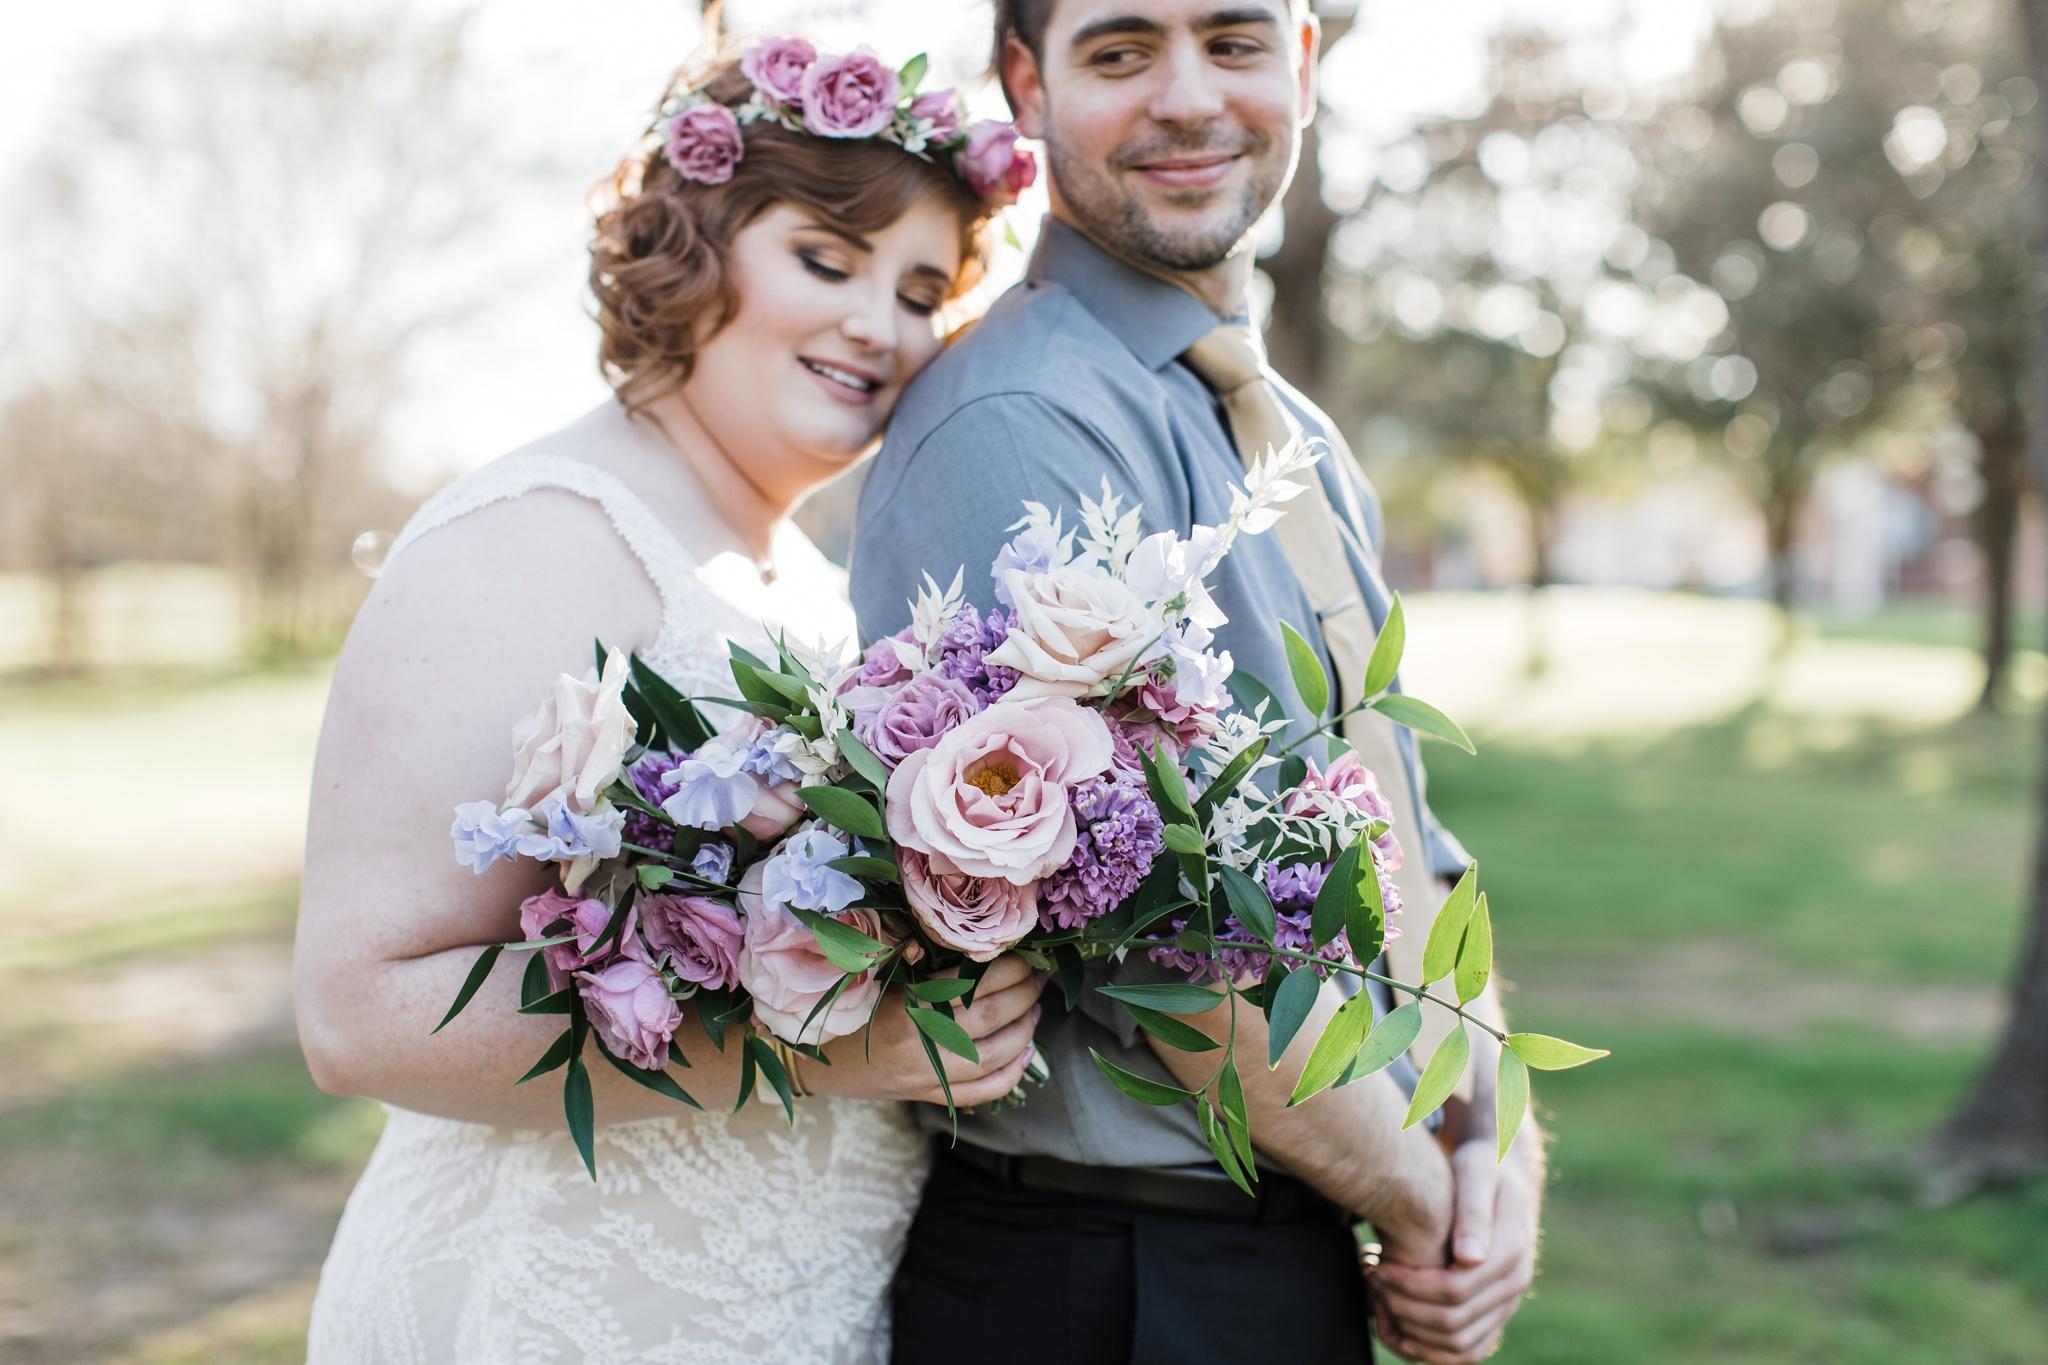 DFW Wedding Photographermound_wedding_photographer-17